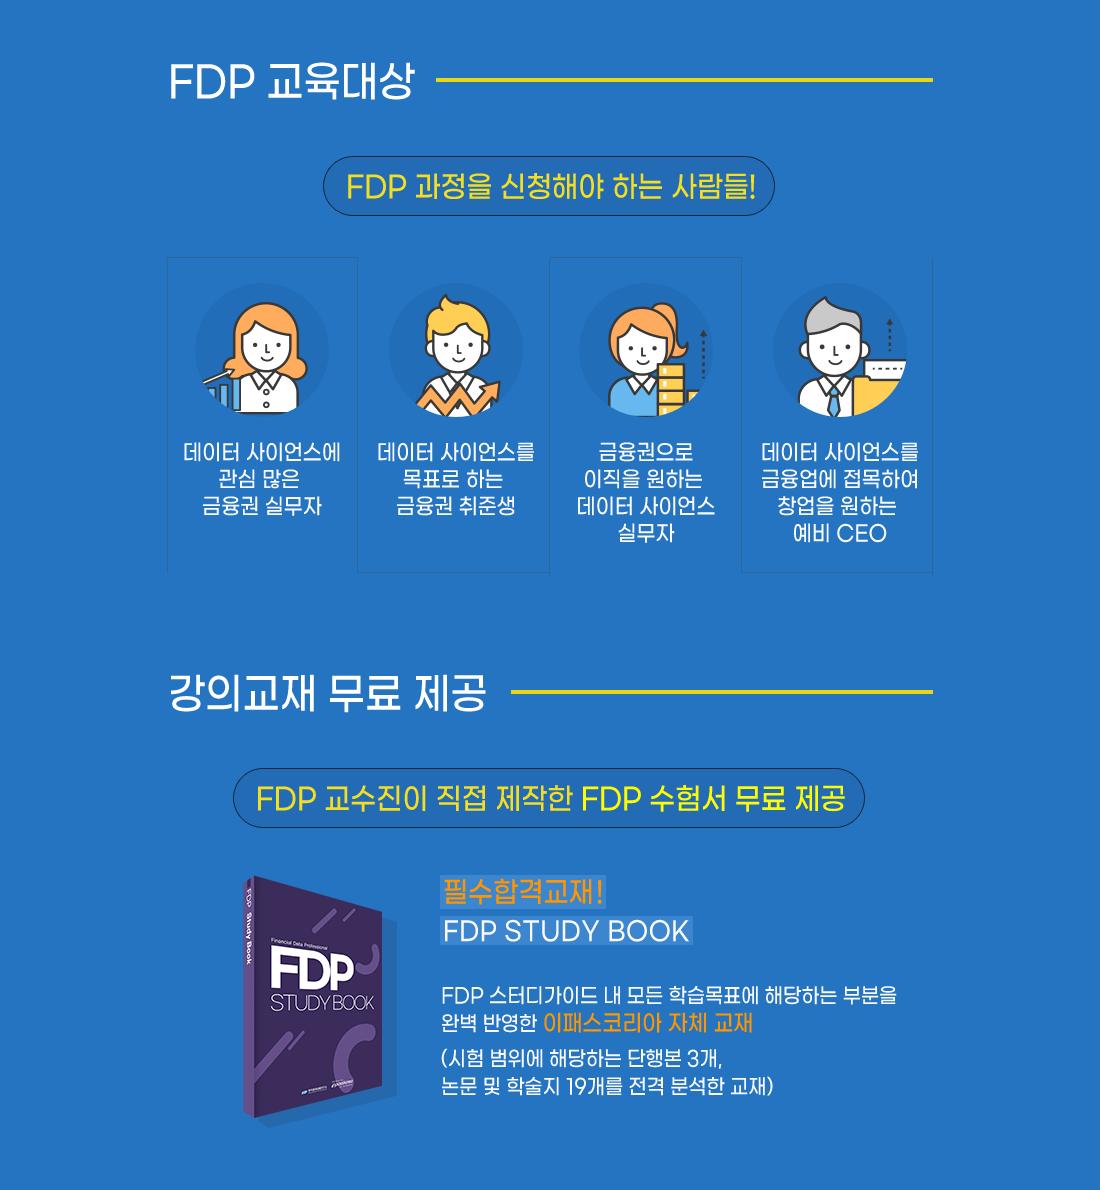 FDP 교육대상 강의교재 무료 제공